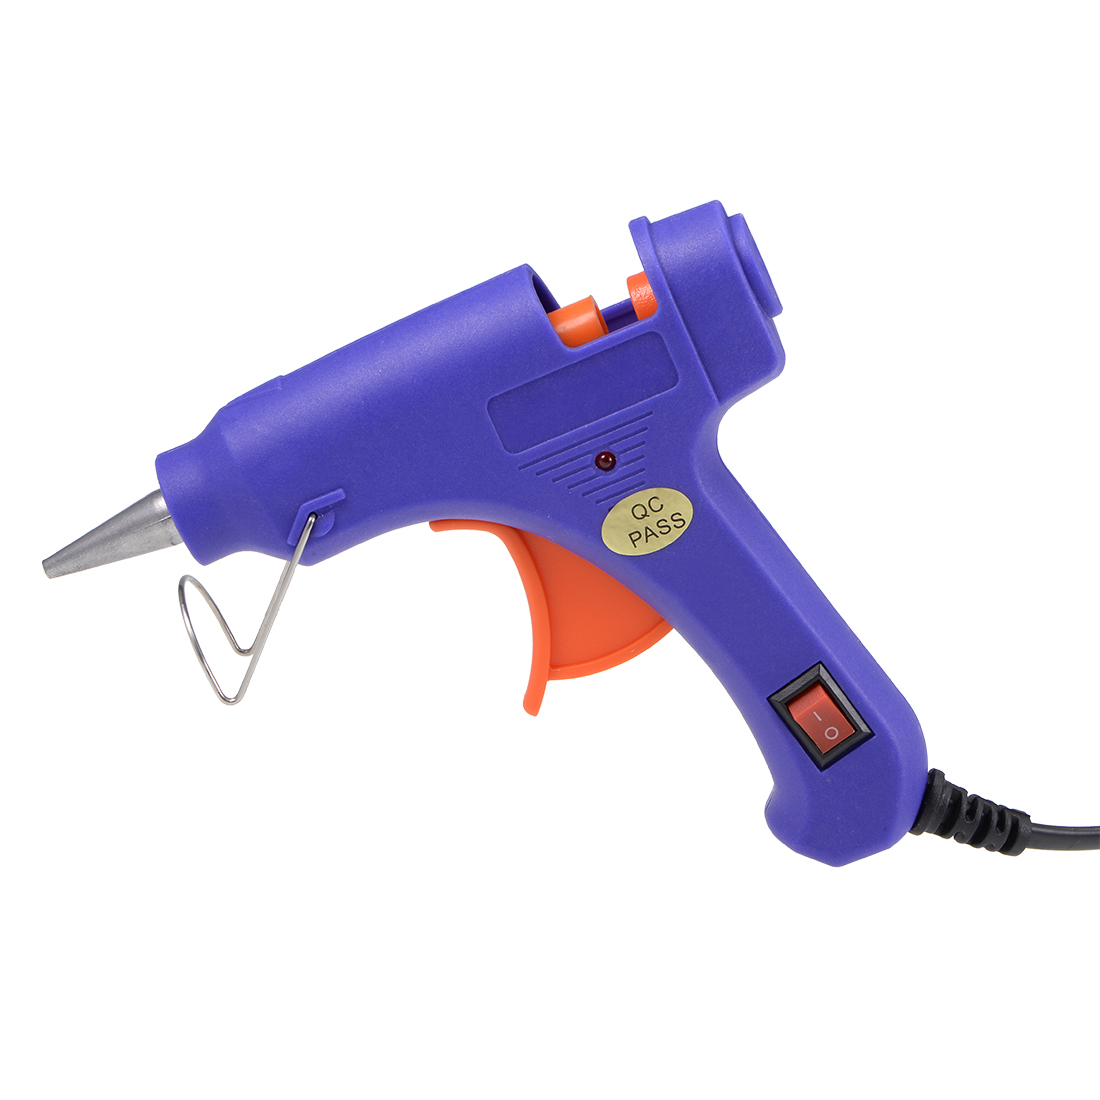 Hot Melt Glue Gun for Craft Projects Sealing Daily Repairs US Plug AC 100V-240V